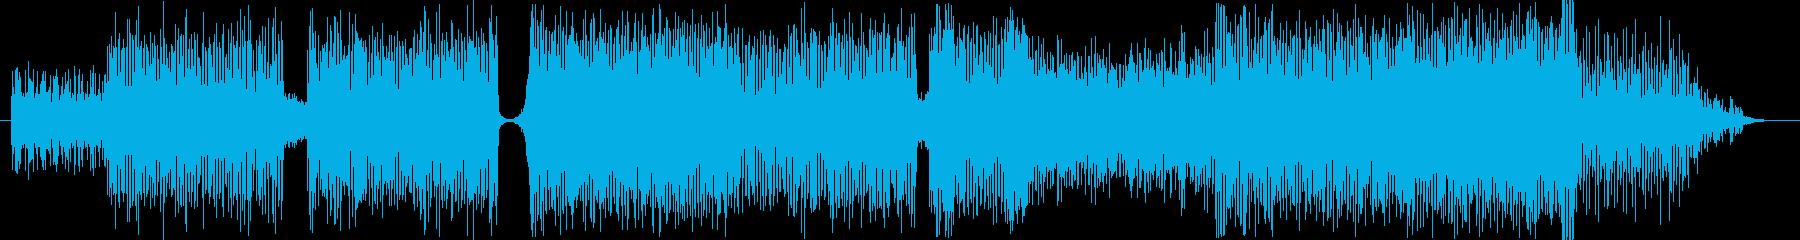 Spark / スパークの再生済みの波形